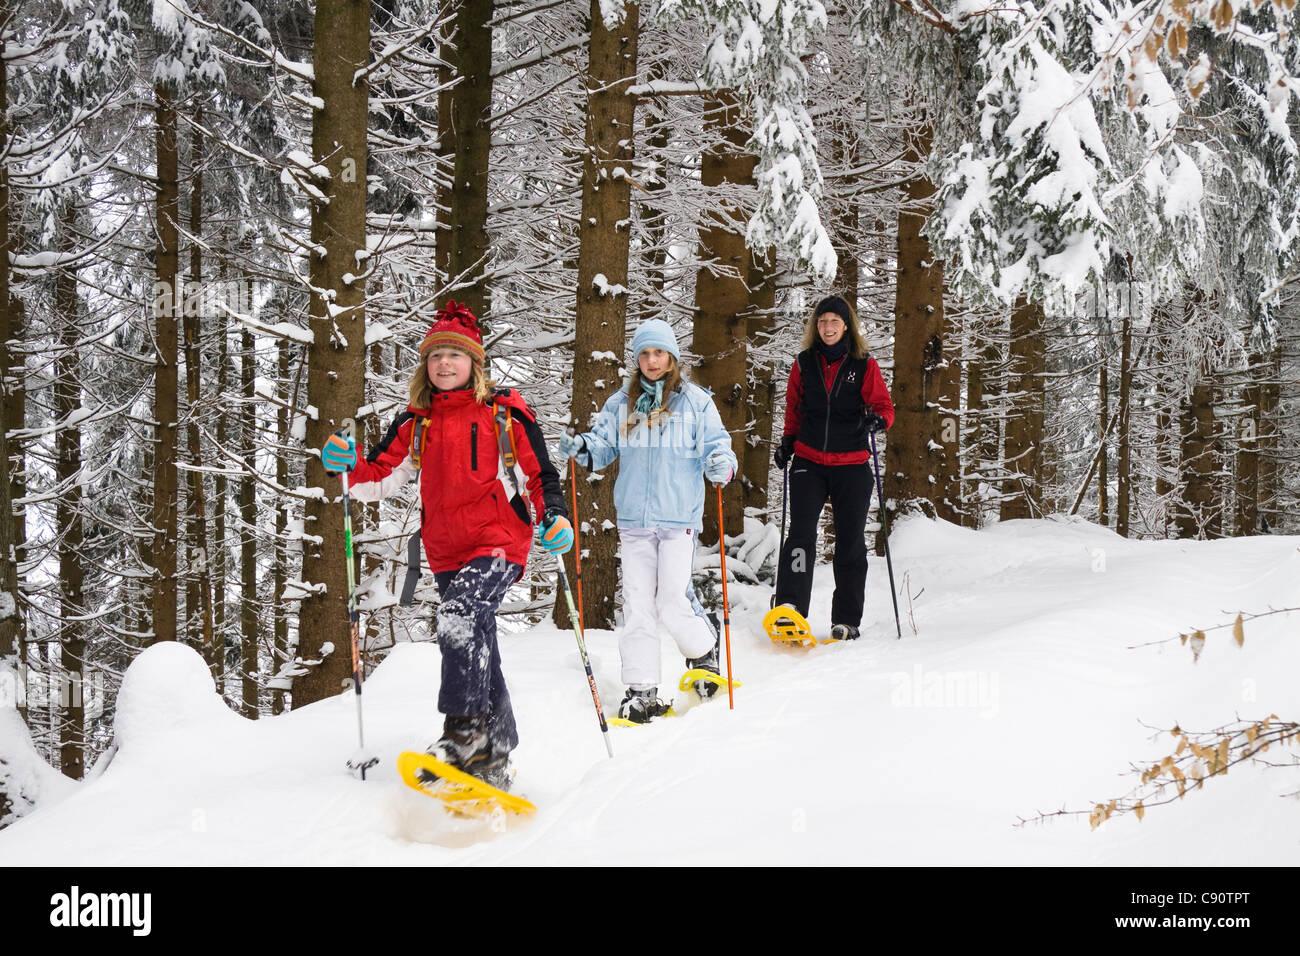 Snoeshoe les randonneurs dans les Alpes bavaroises, Upper Bavaria, Germany, Europe Photo Stock